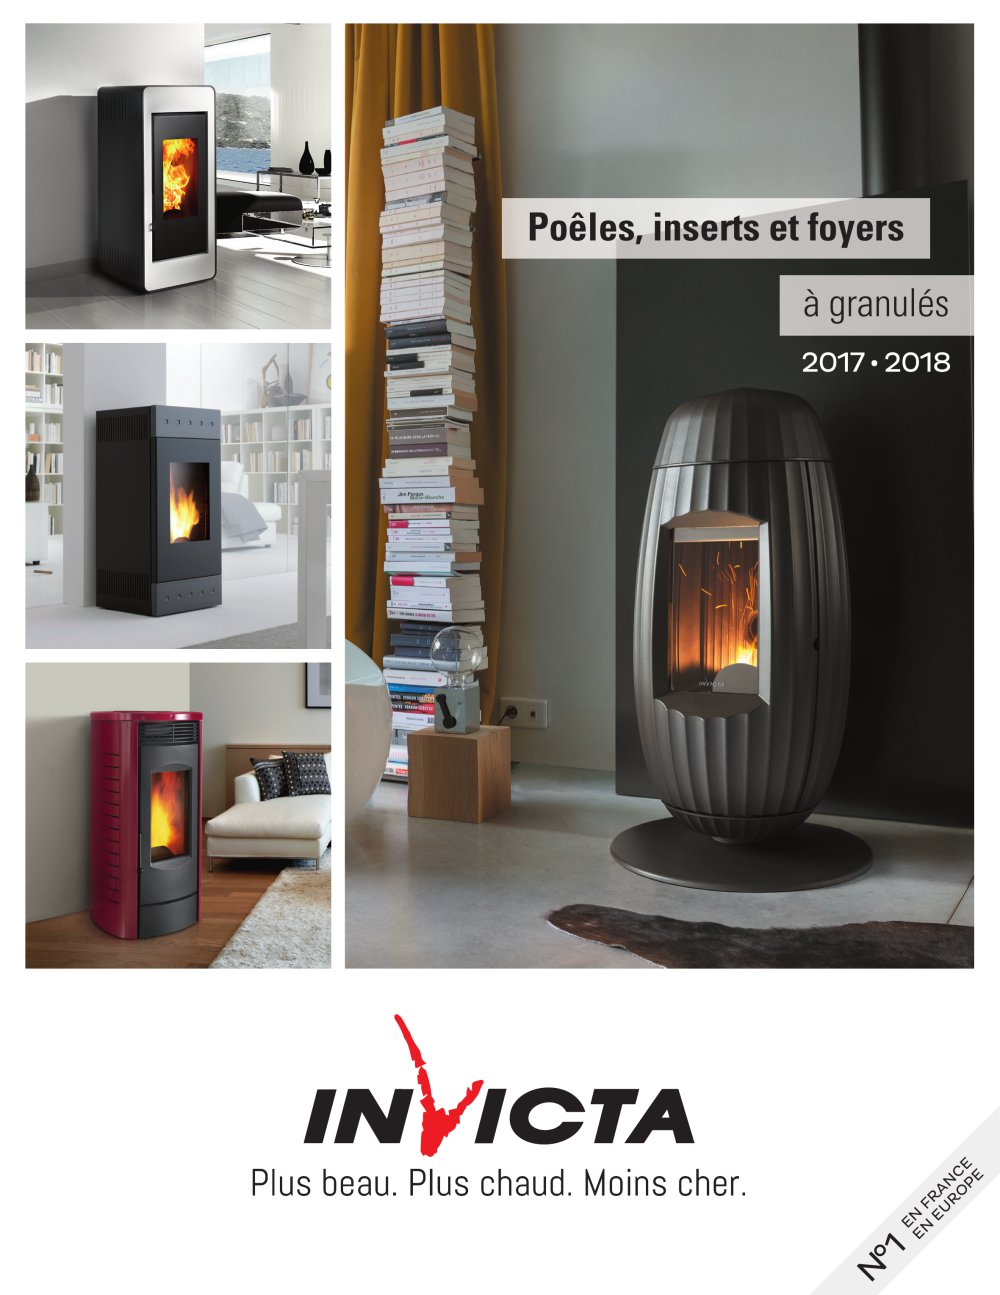 Catalogue Poeles Inserts Foyers Granules Invicta Catalogue Pdf